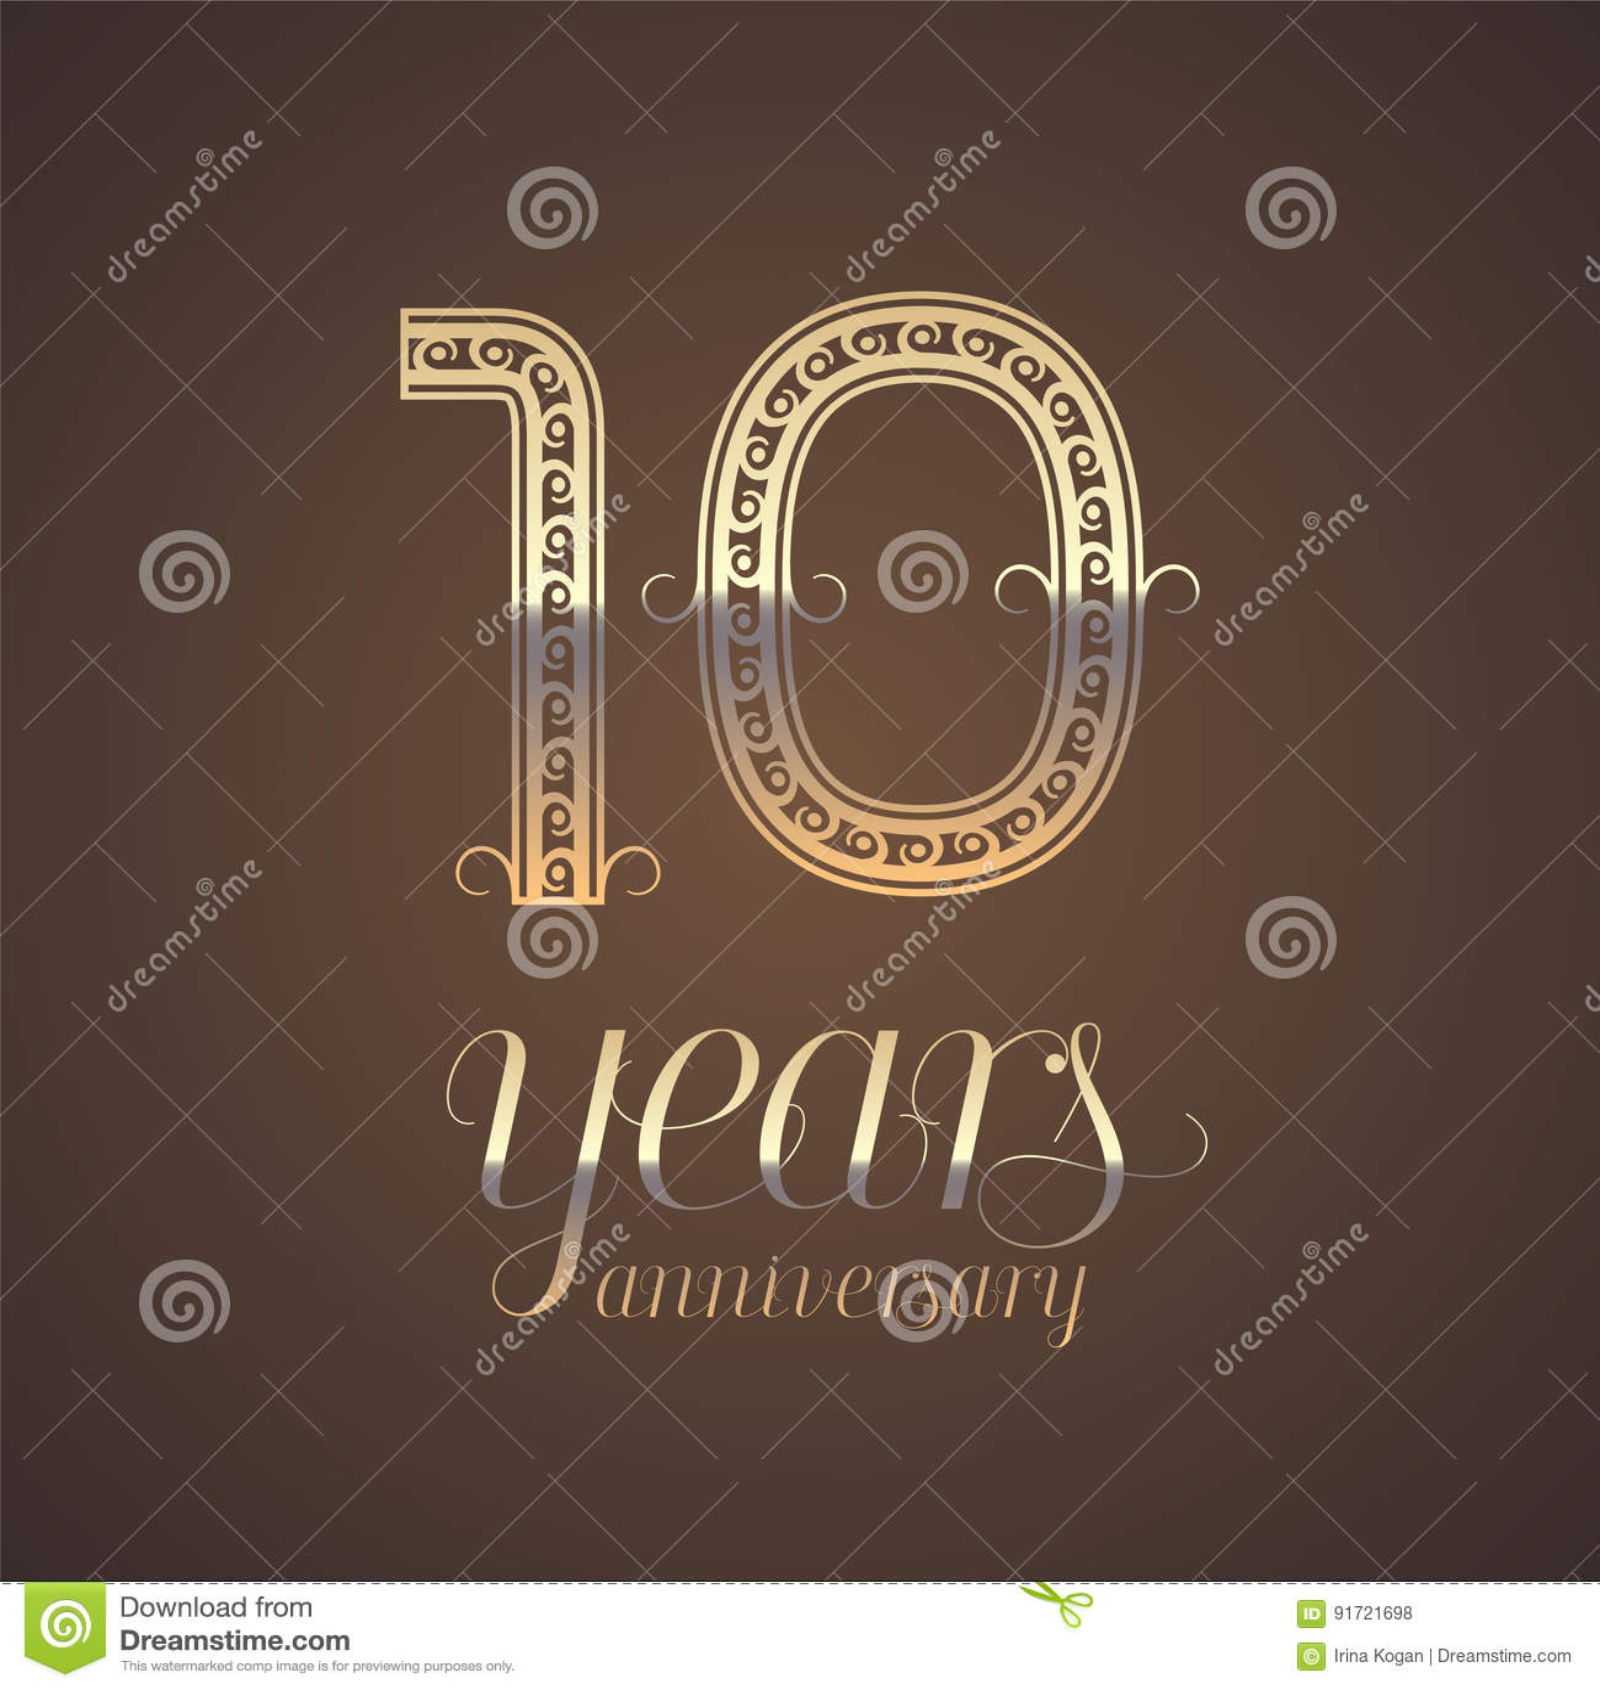 10 Years Anniversary Vector Icon Symbol Stock Vector Illustration